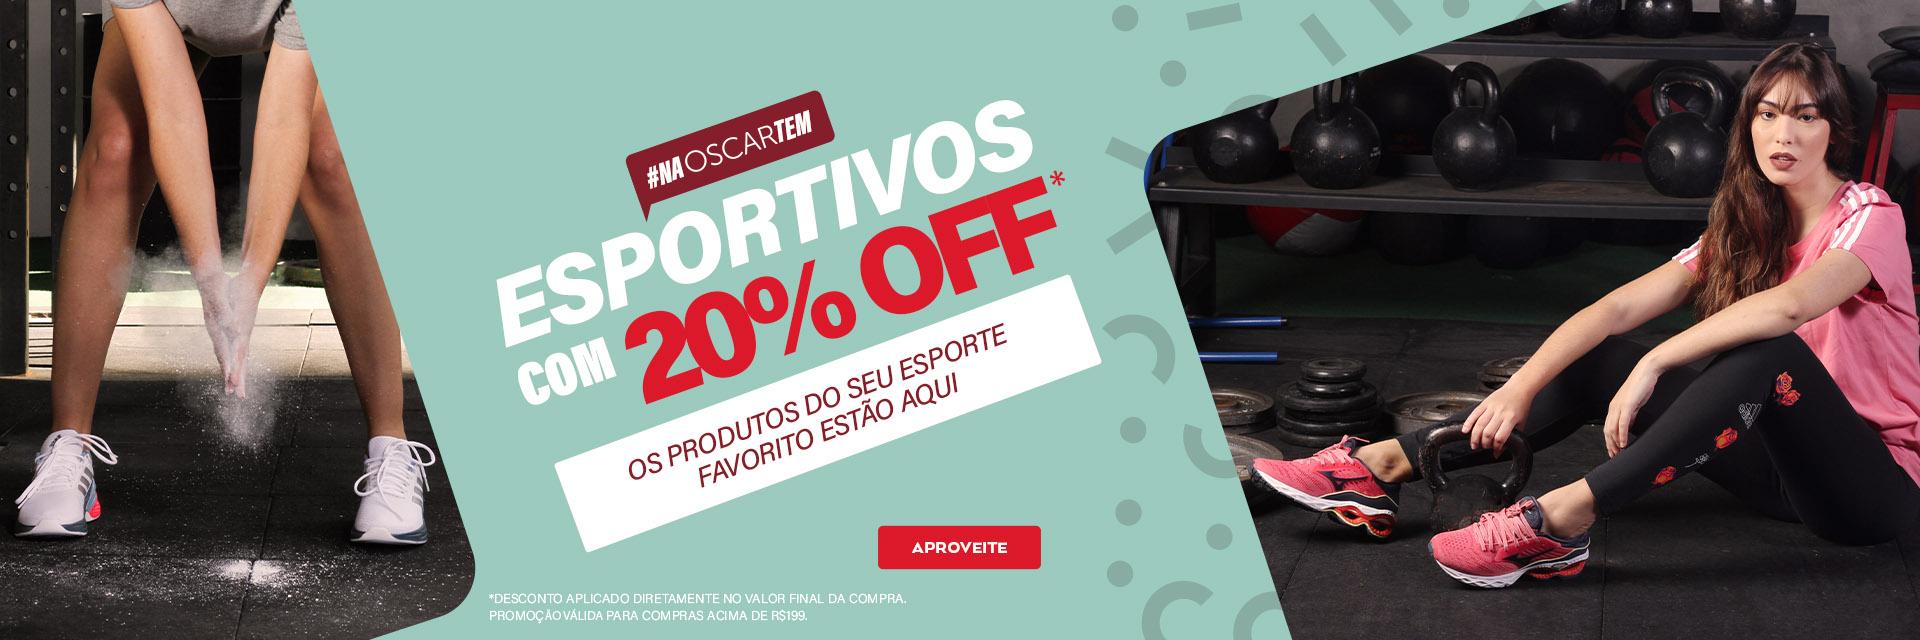 20% off Espotivos l Desktop